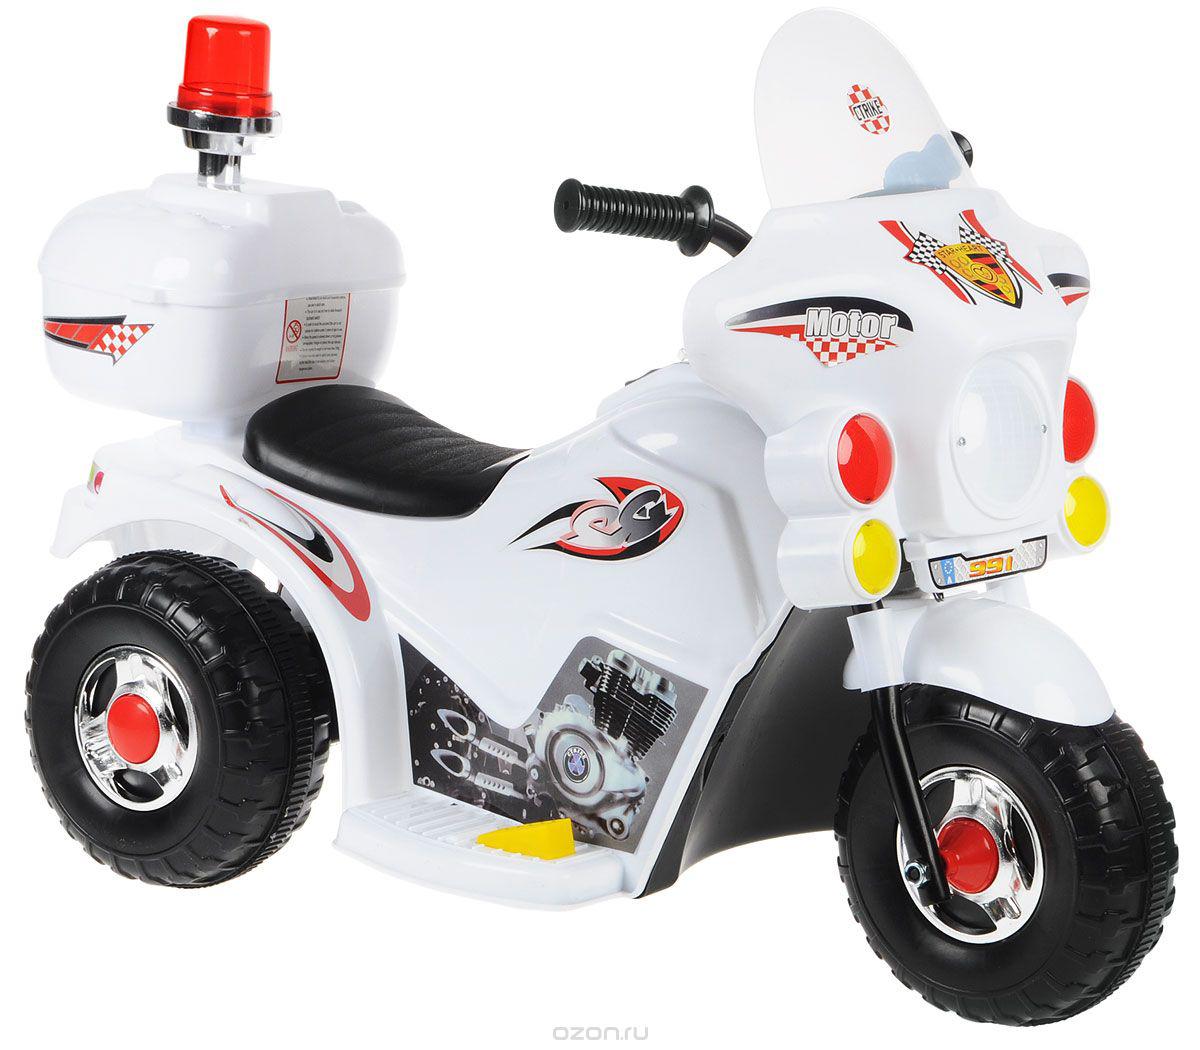 Электромотоцикл с маячком LL-999 цвет белый - Электромобили